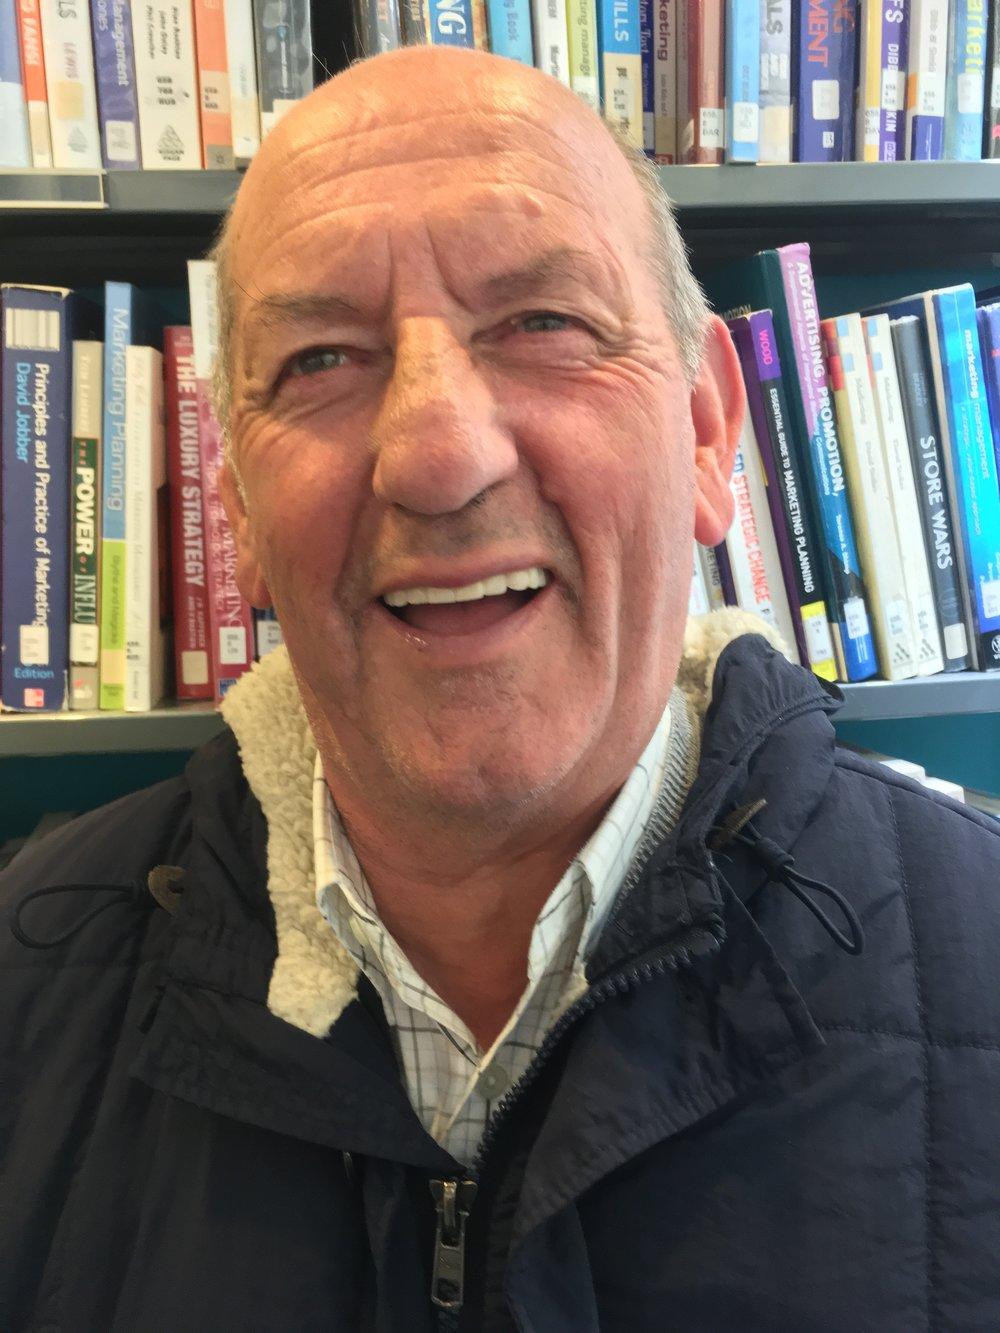 George - Age: 67